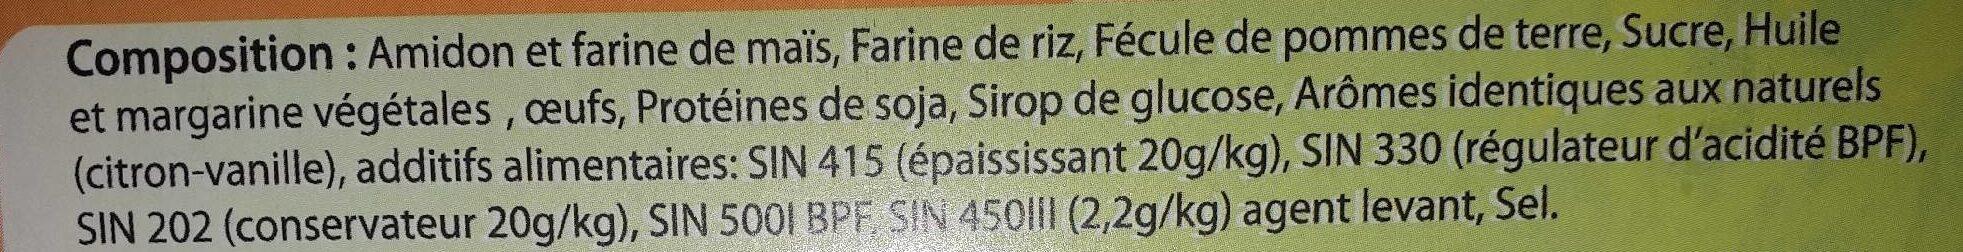 Kaâk citron vanille - المكونات - fr